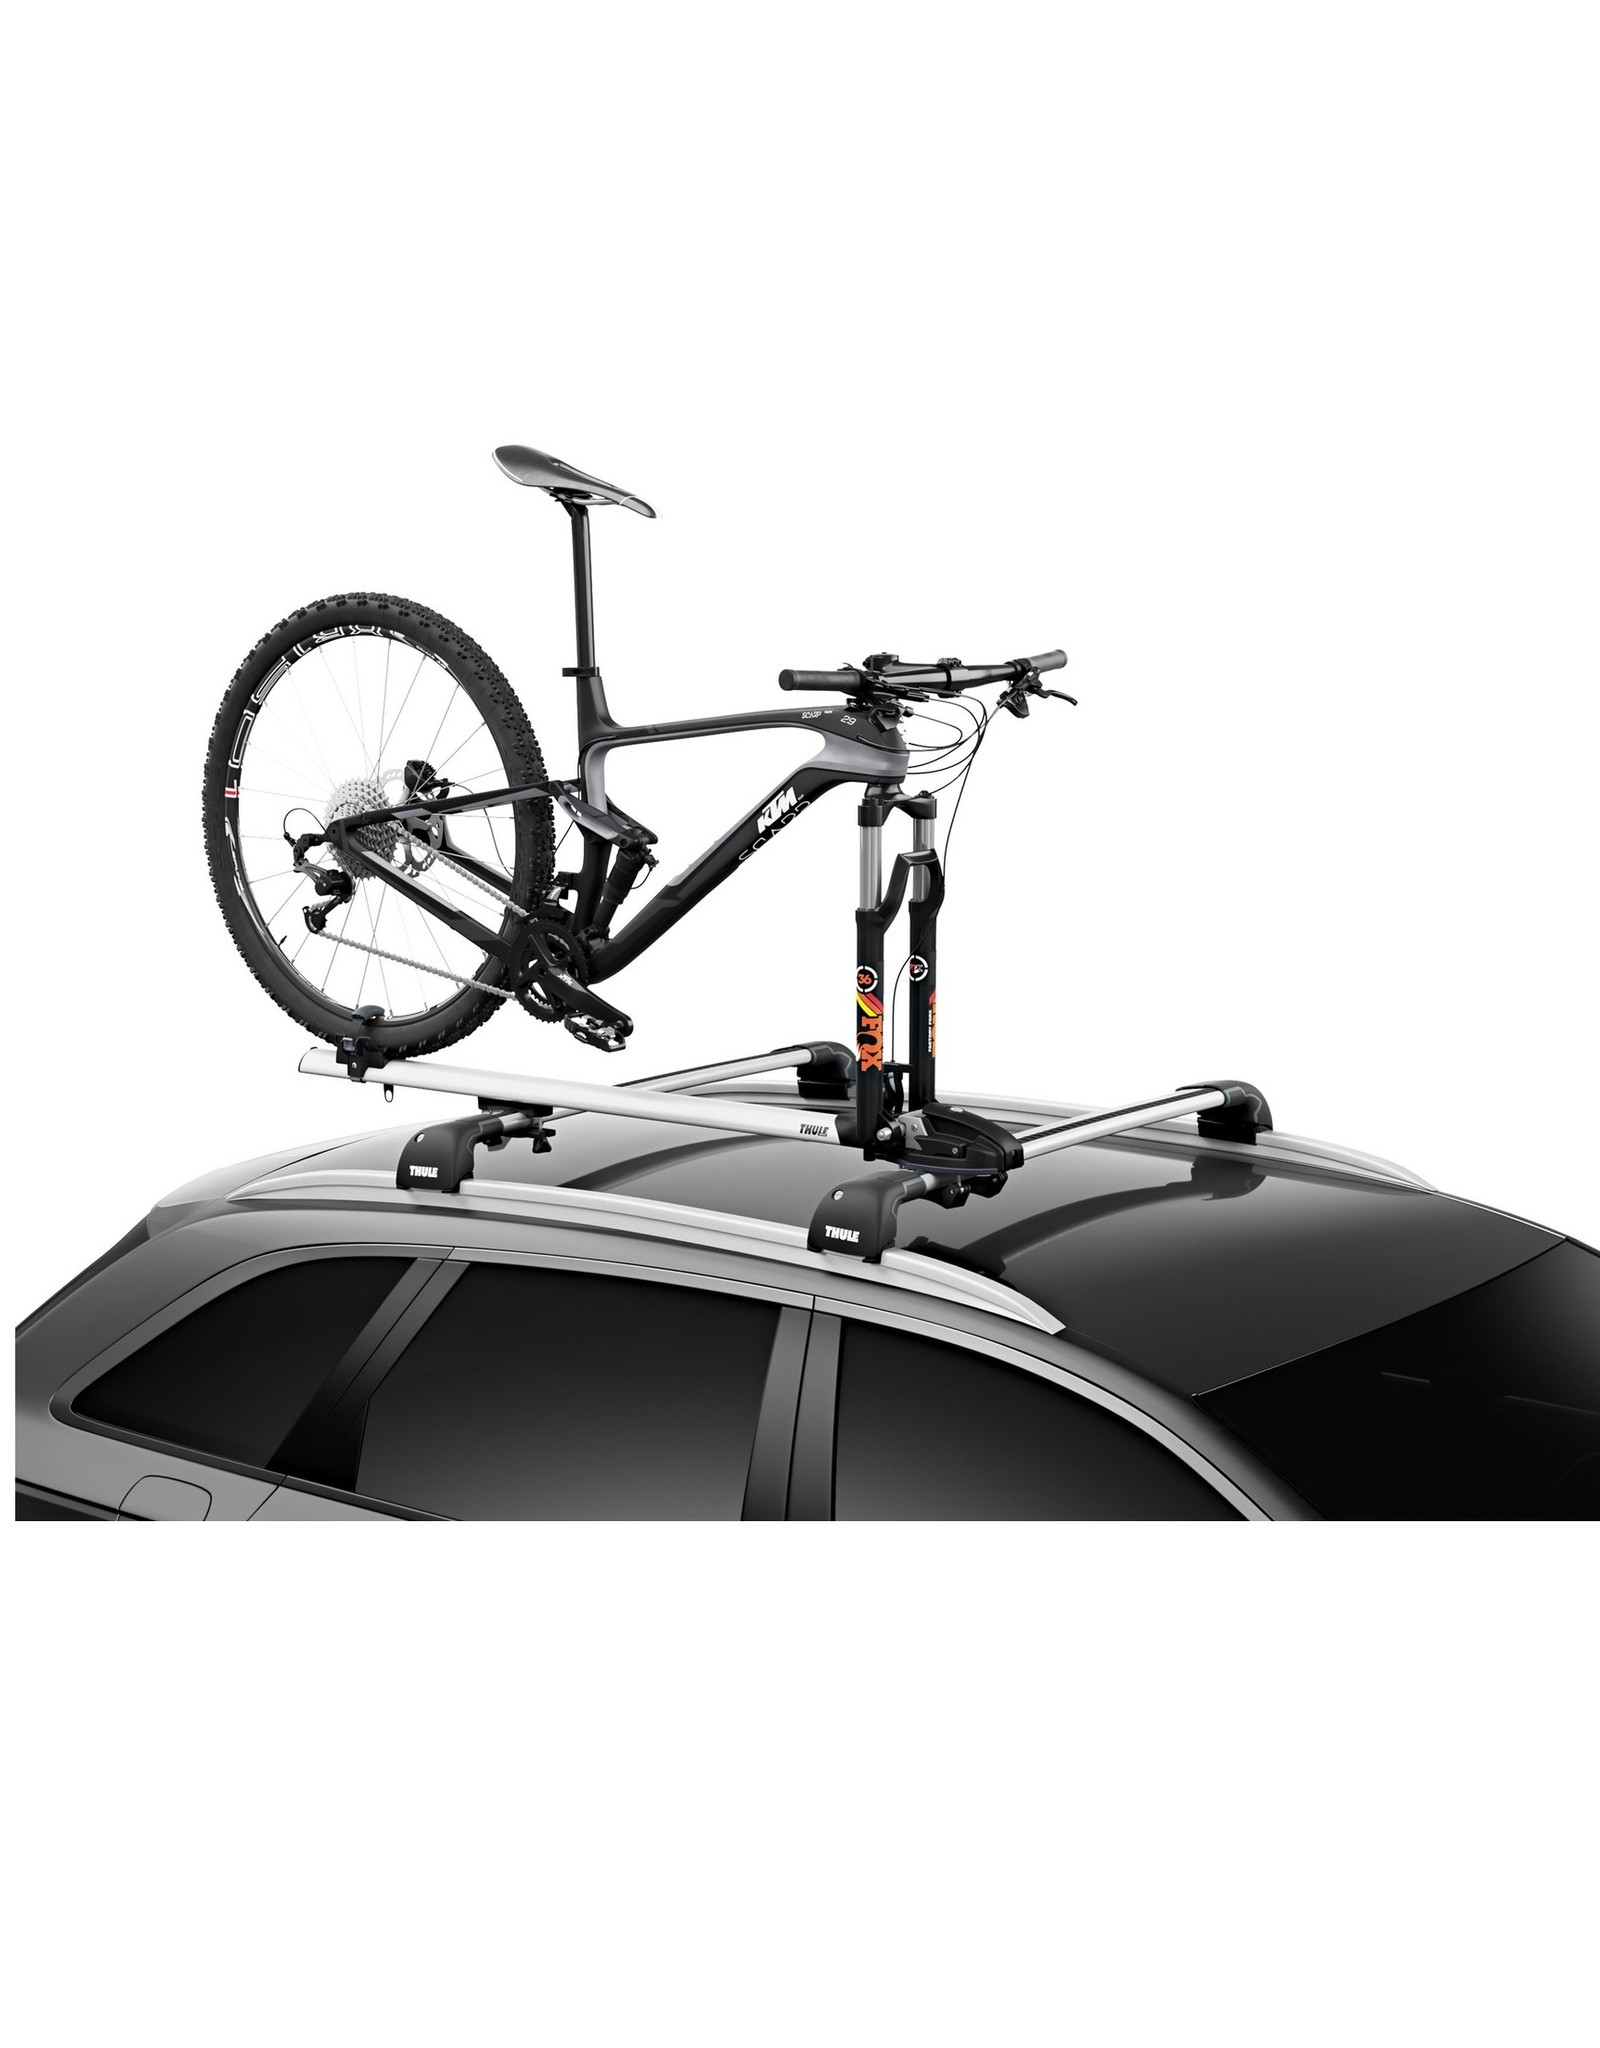 Car Rack - Thule ThruRide, QR/Thru Axle system Roof Rack (Single)